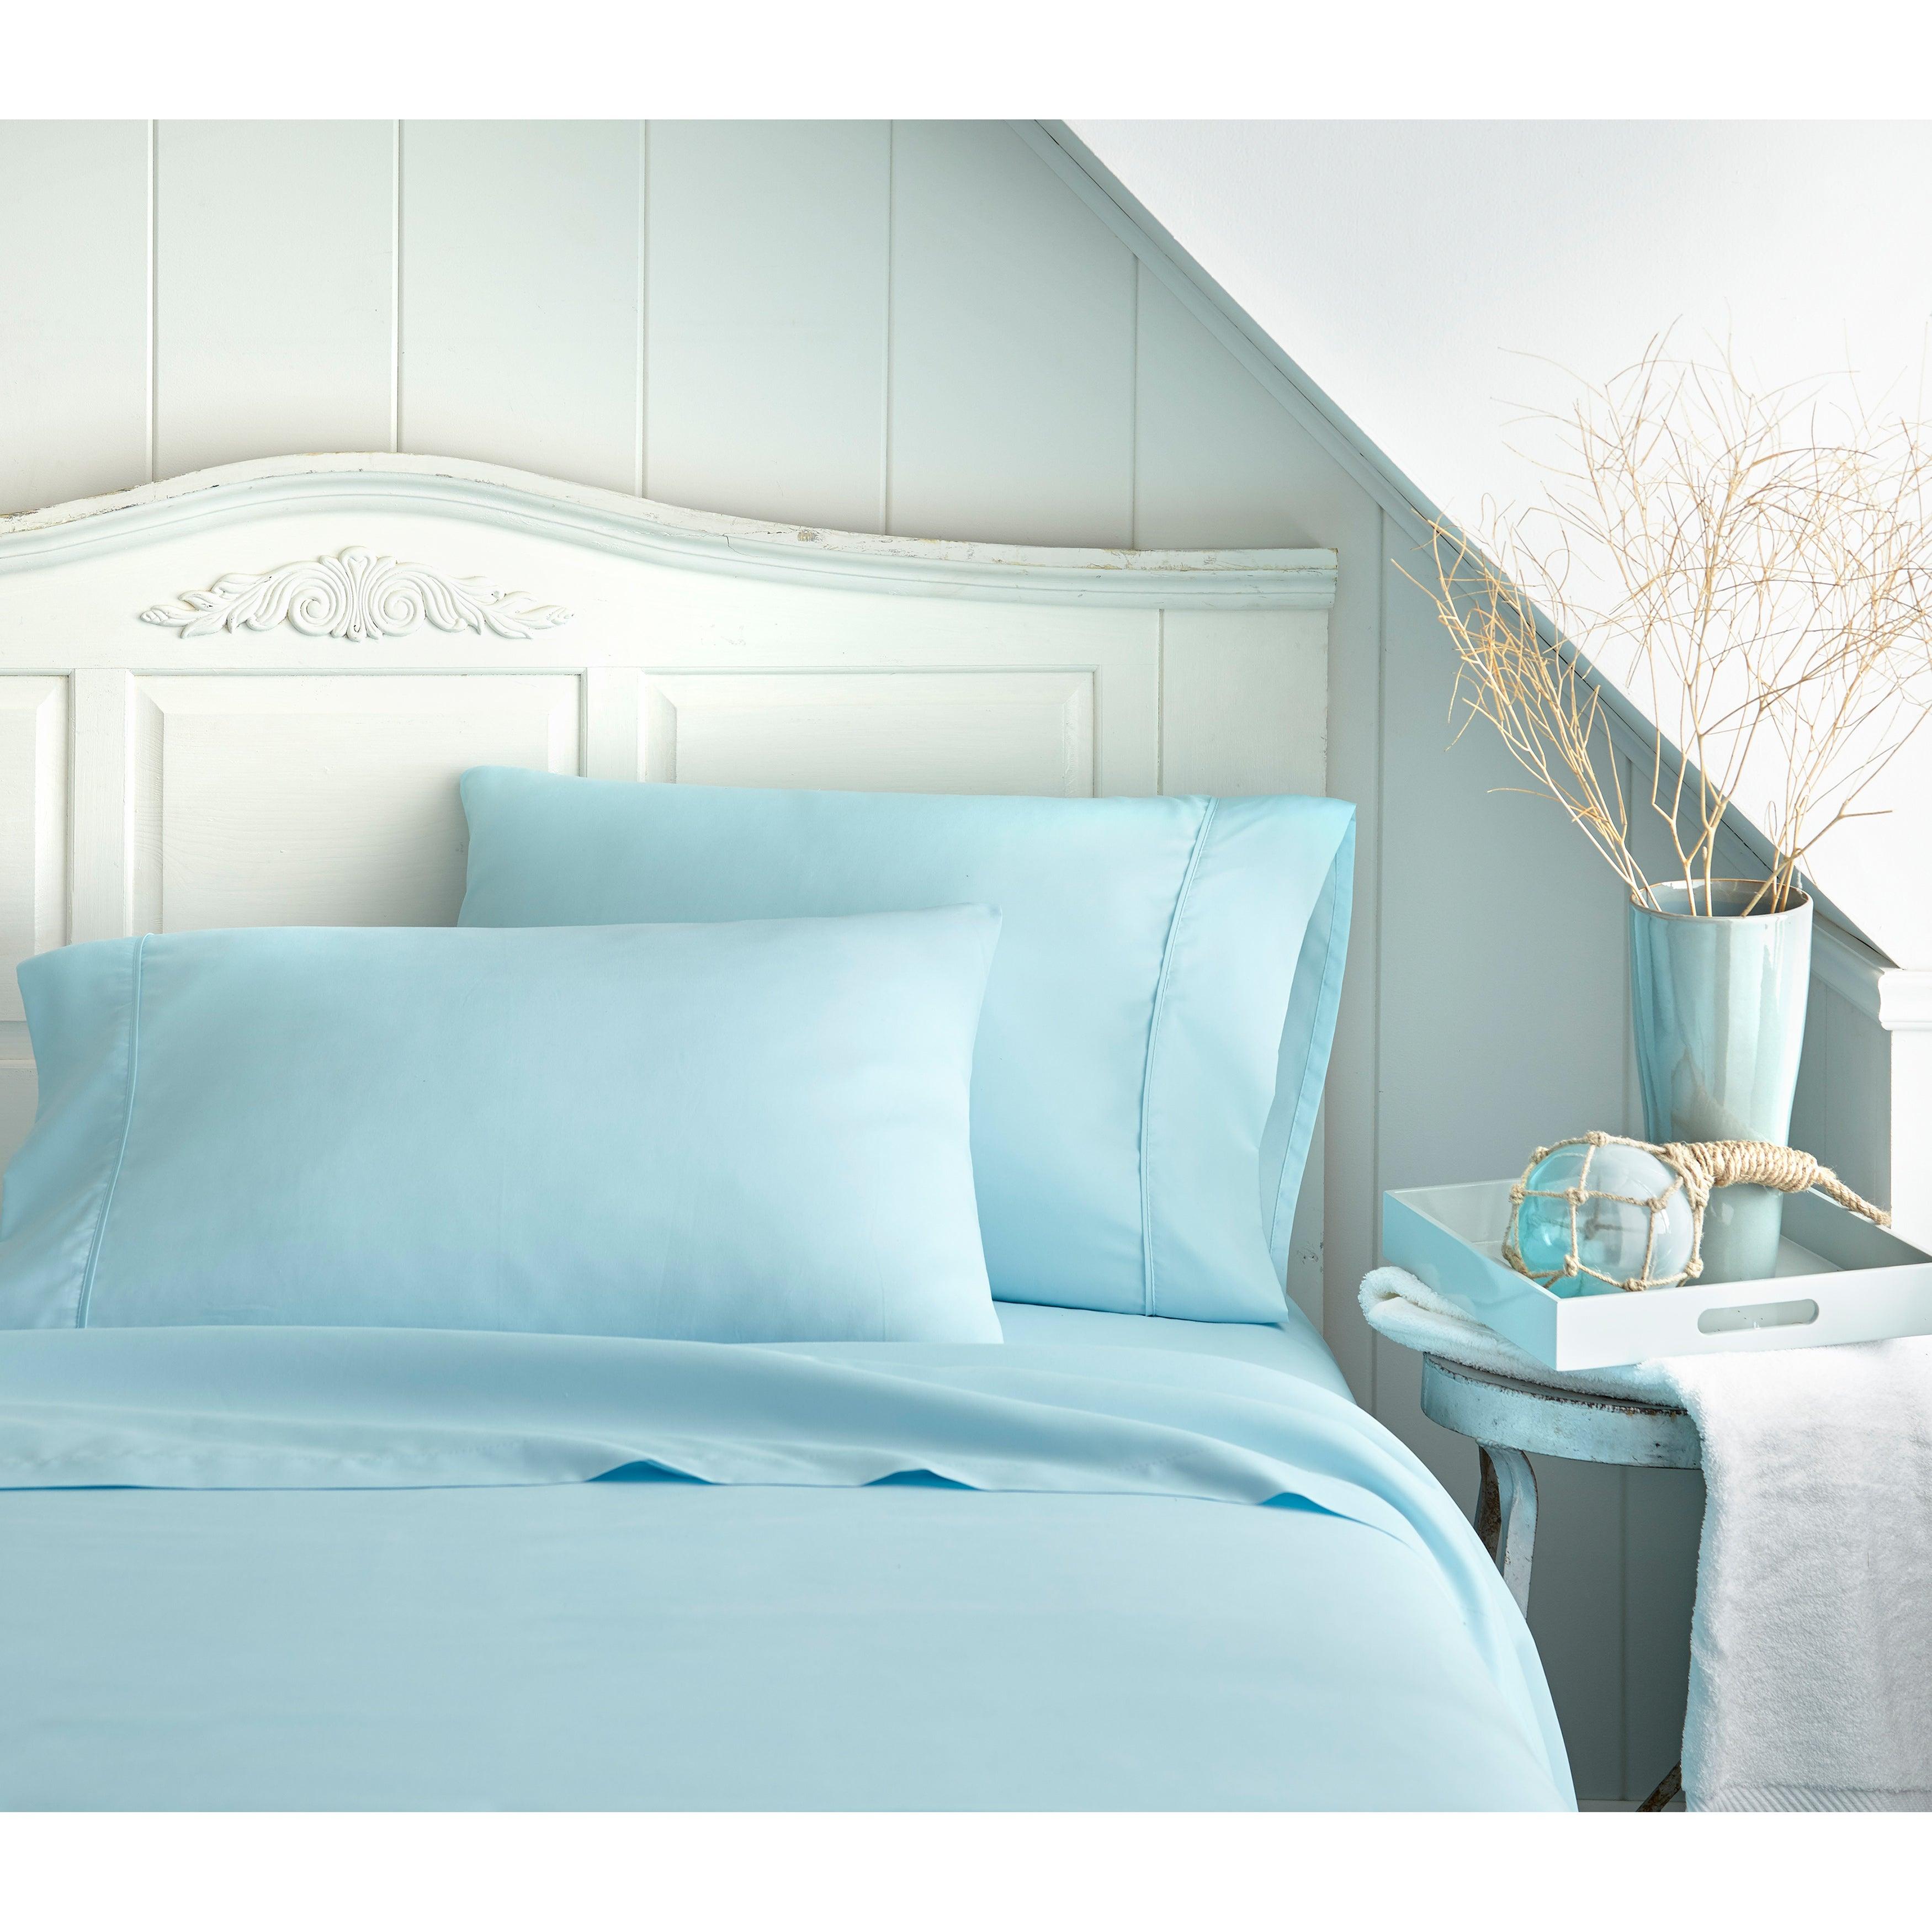 Soft Essentials Ultra-Soft Microfiber Luxury 4-piece Bed Sheet Set